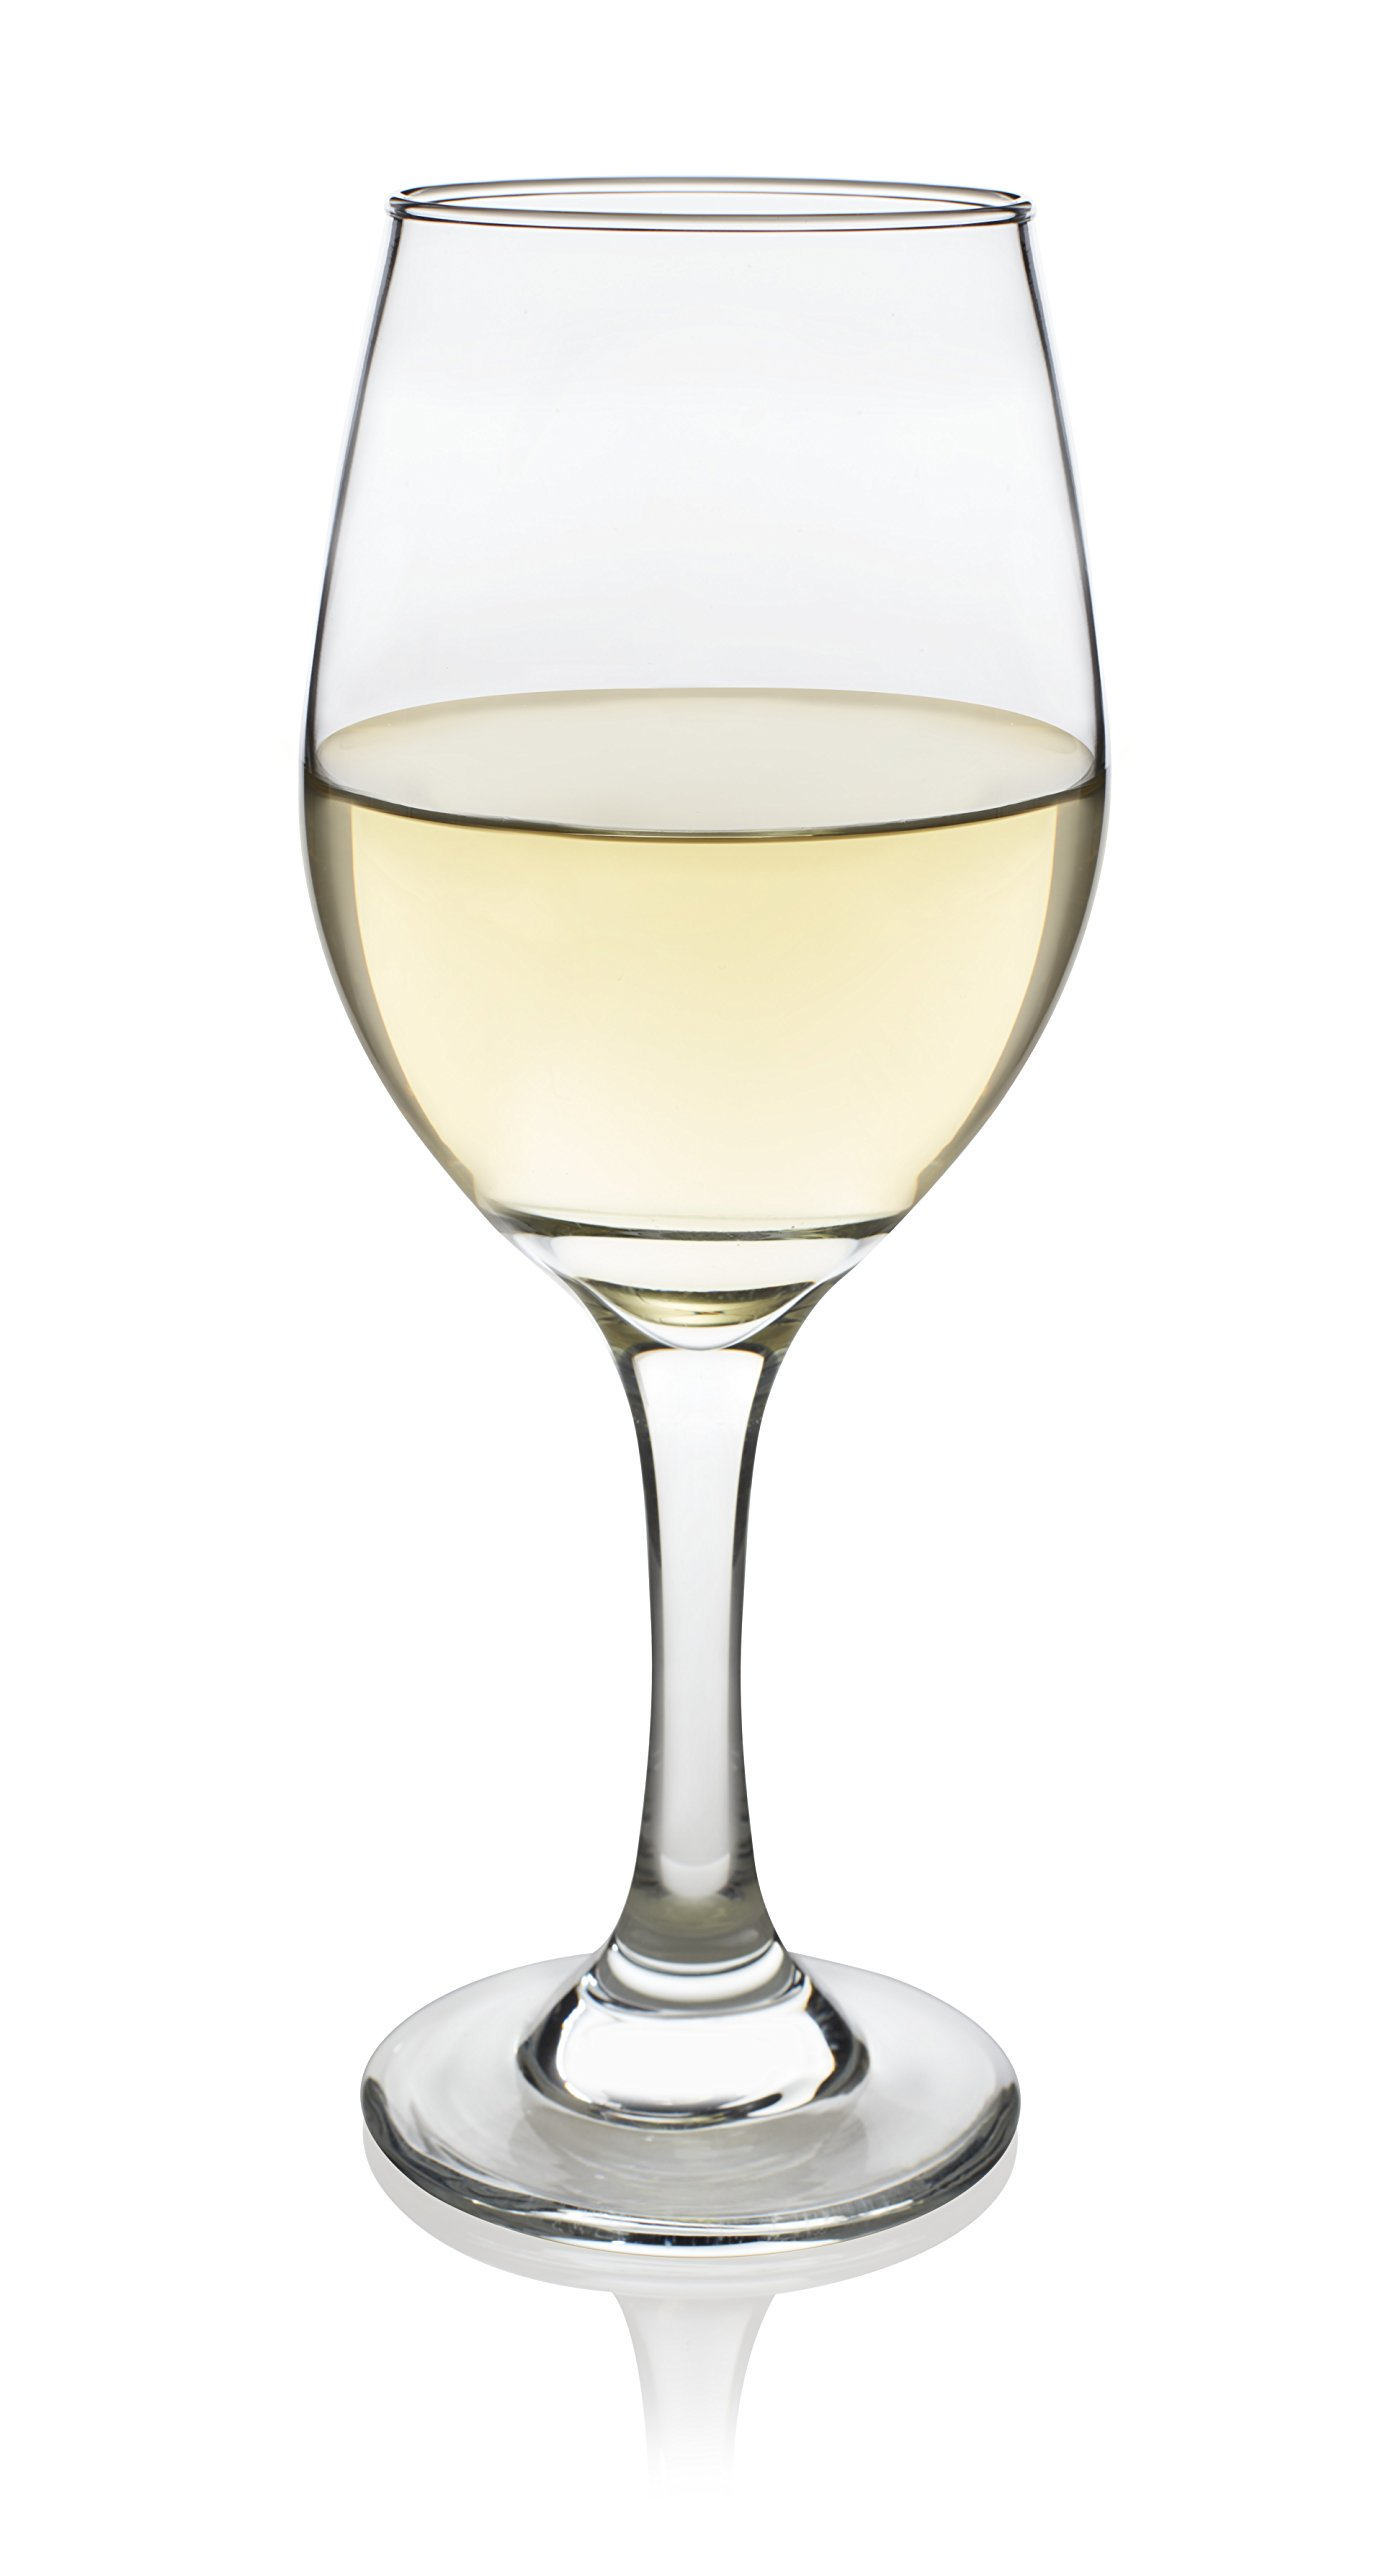 Libbey Basics 4-piece White Wine Glass Set